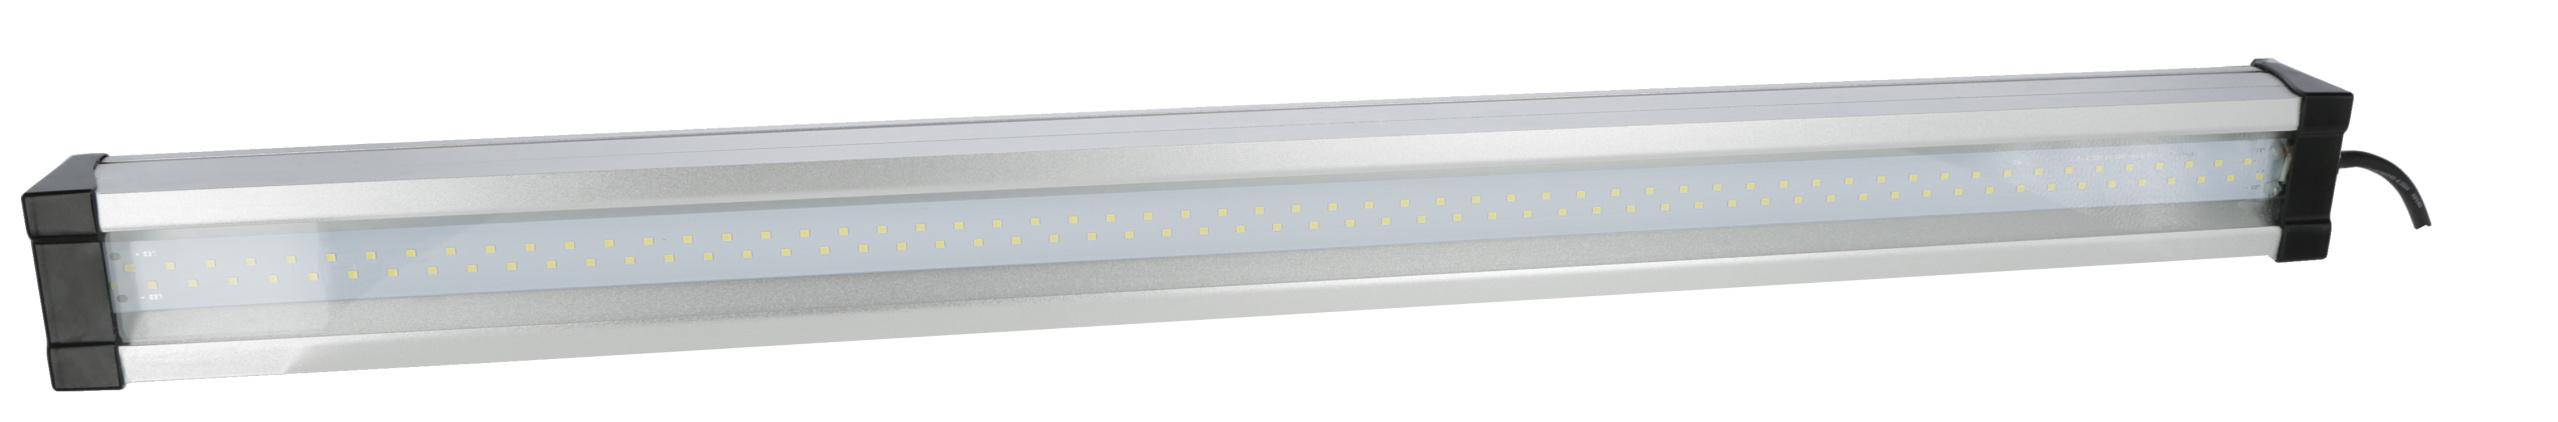 LED-Feuchtraumleuchte FarmPRO, 40W, 90cm